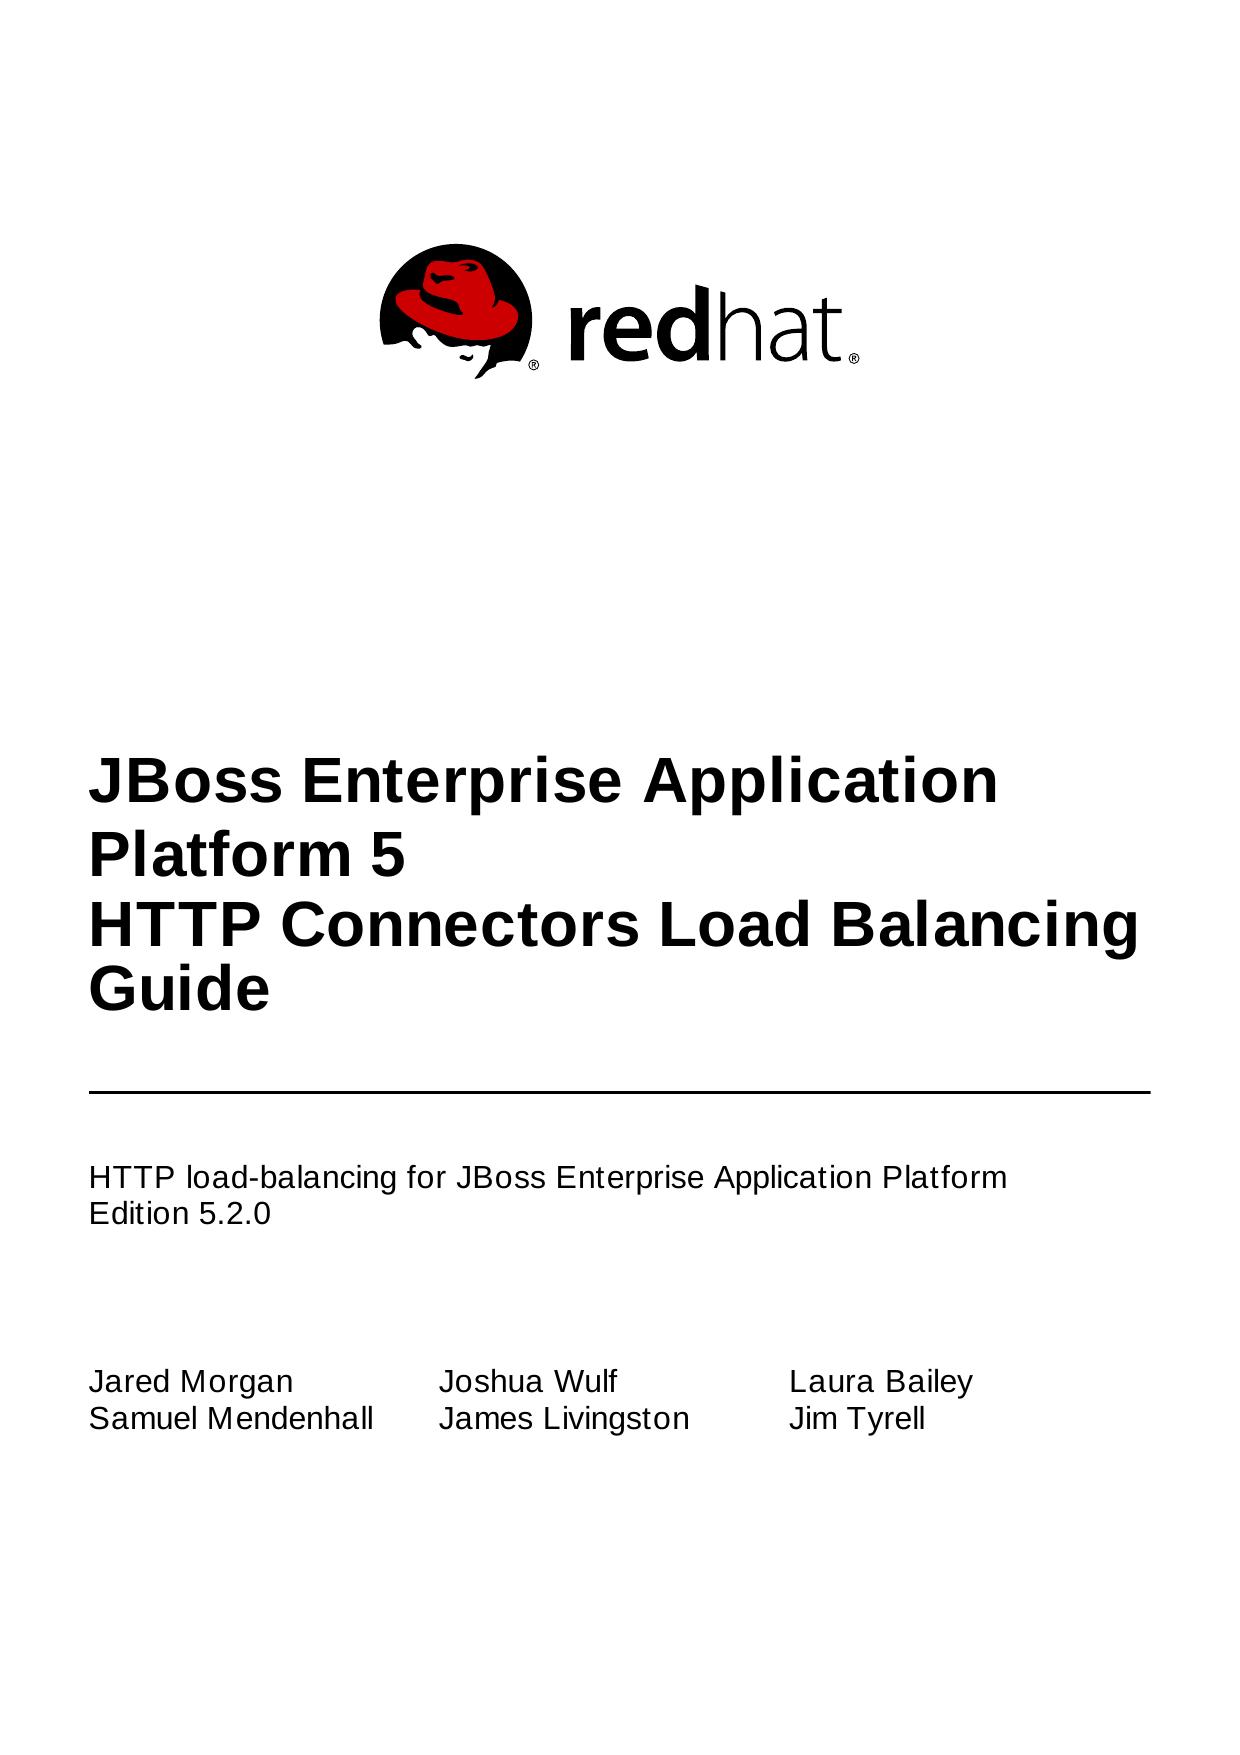 JBoss Enterprise Application Platform 5 HTTP Connectors Load